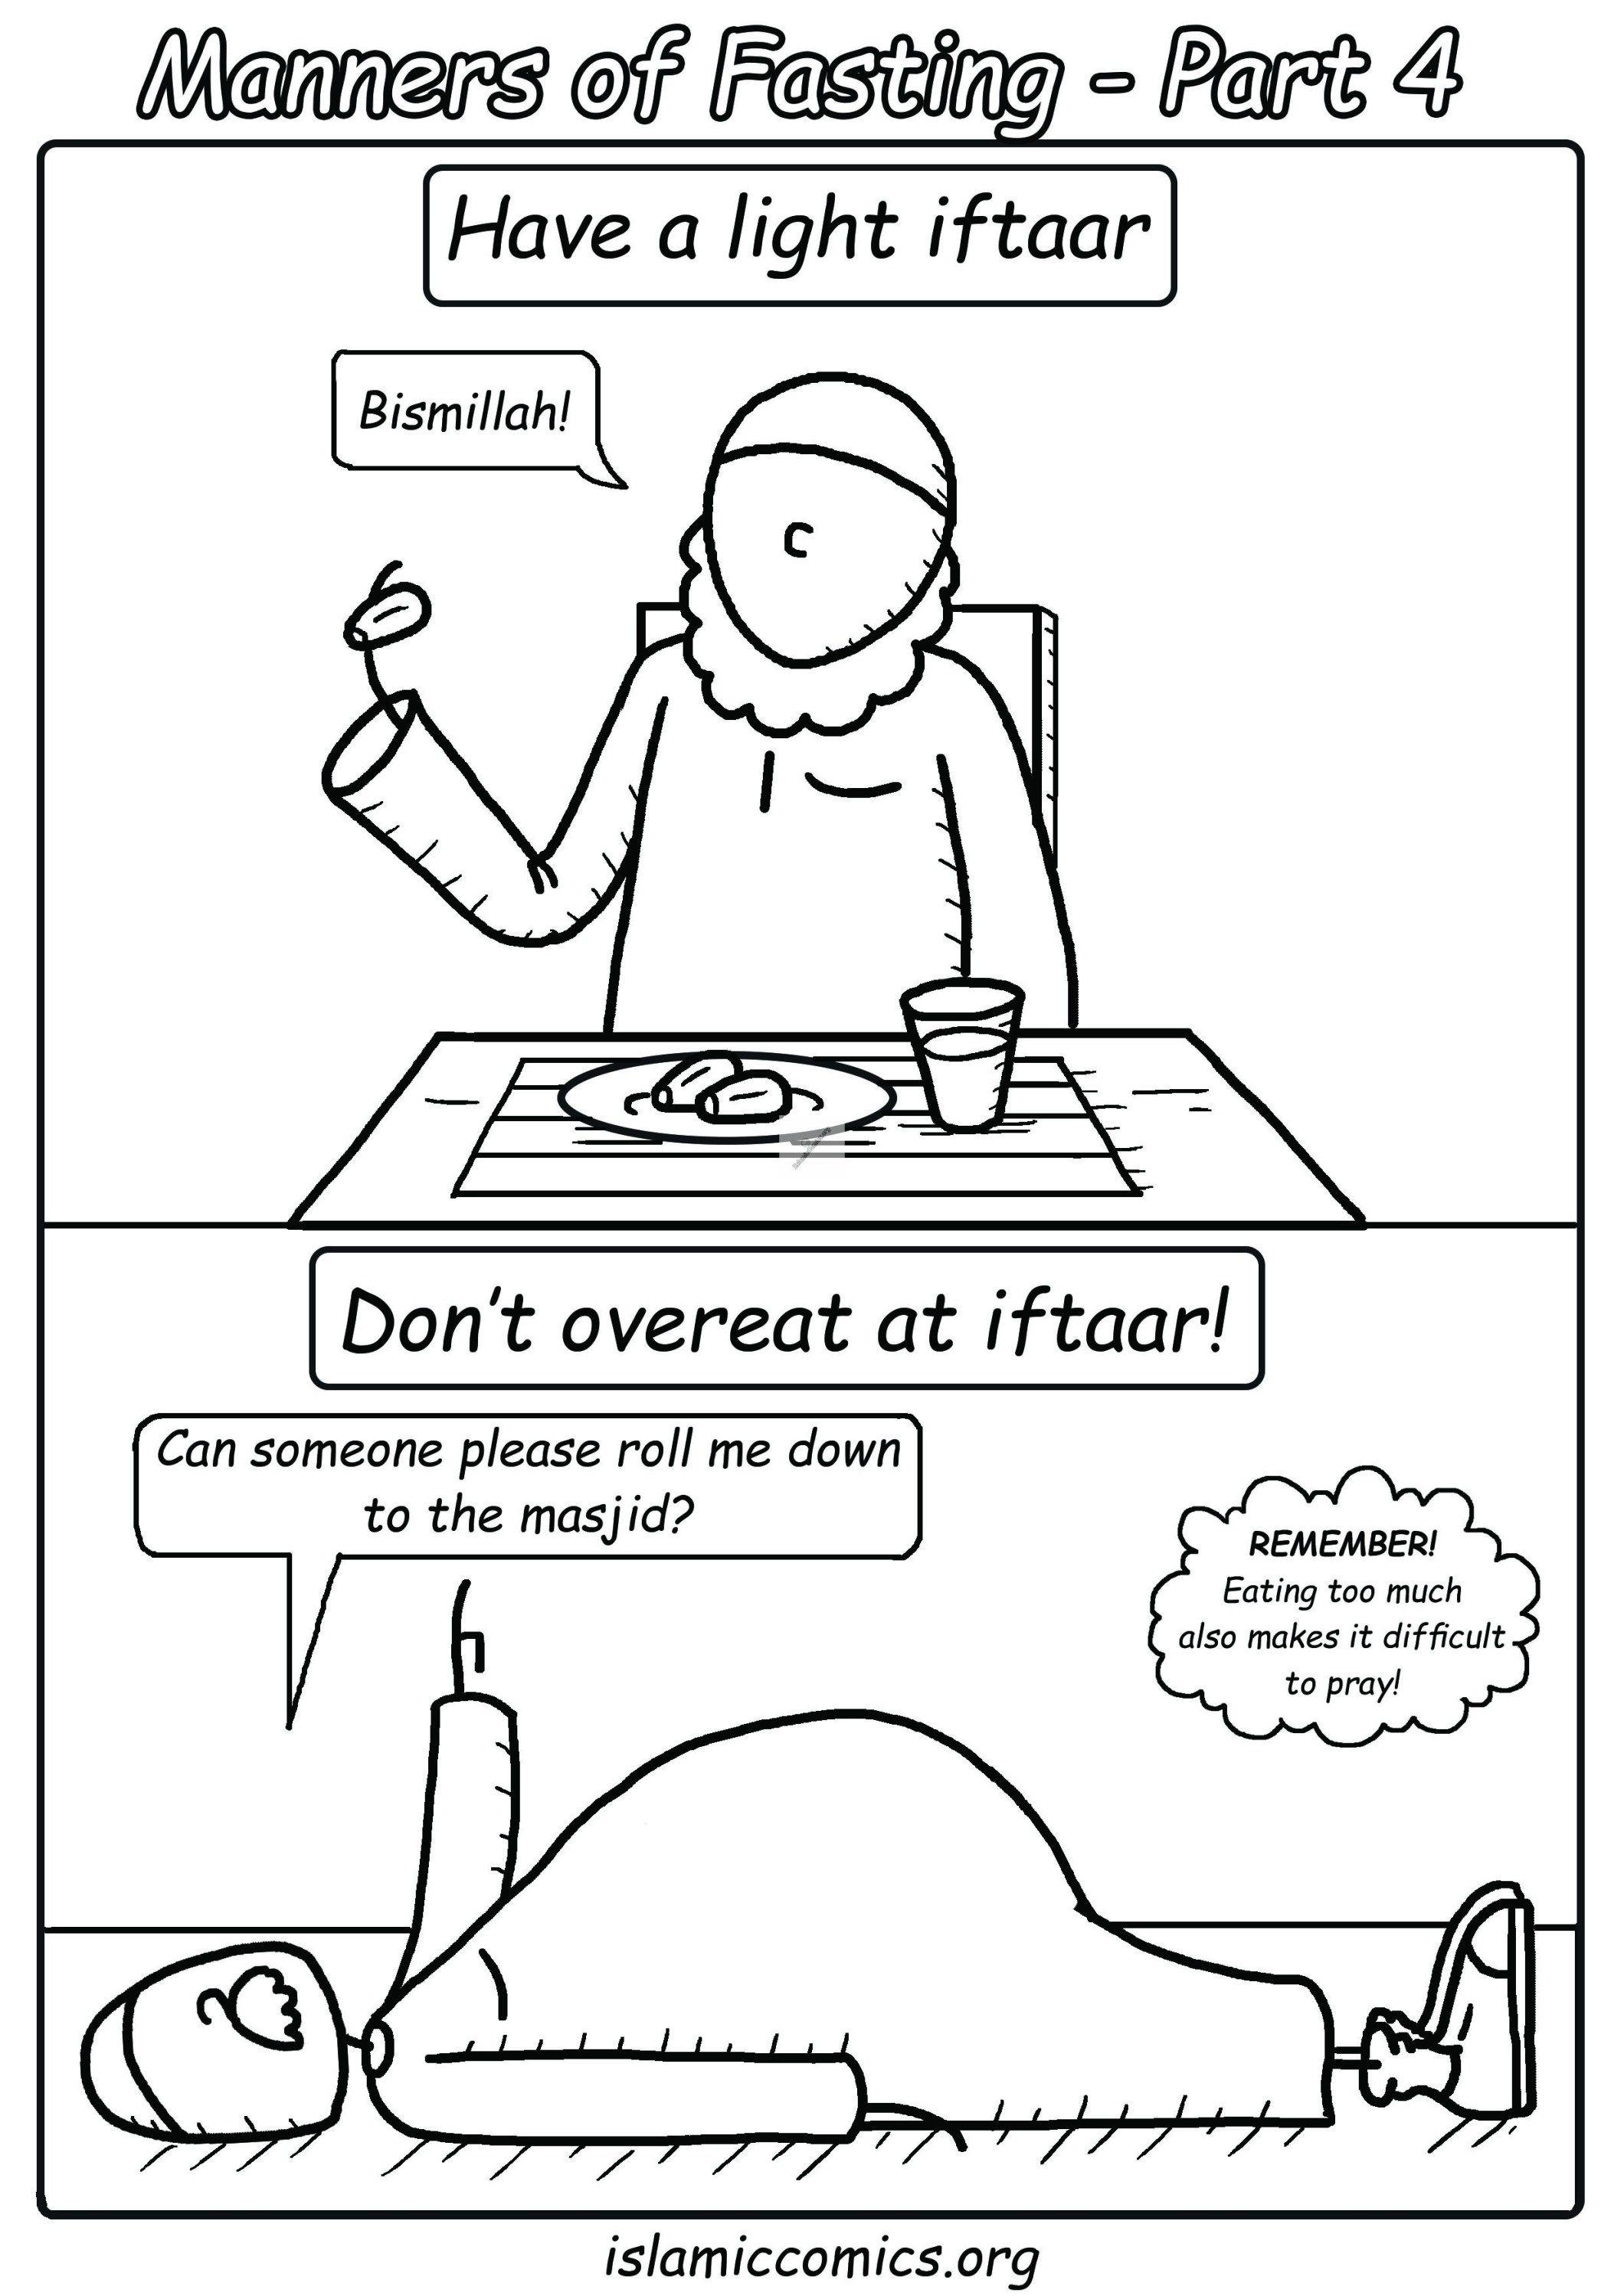 Manners Of Fasting Part 4 Islamic Comics Islamic Books For Kids Muslim Kids Activities Islamic Kids Activities